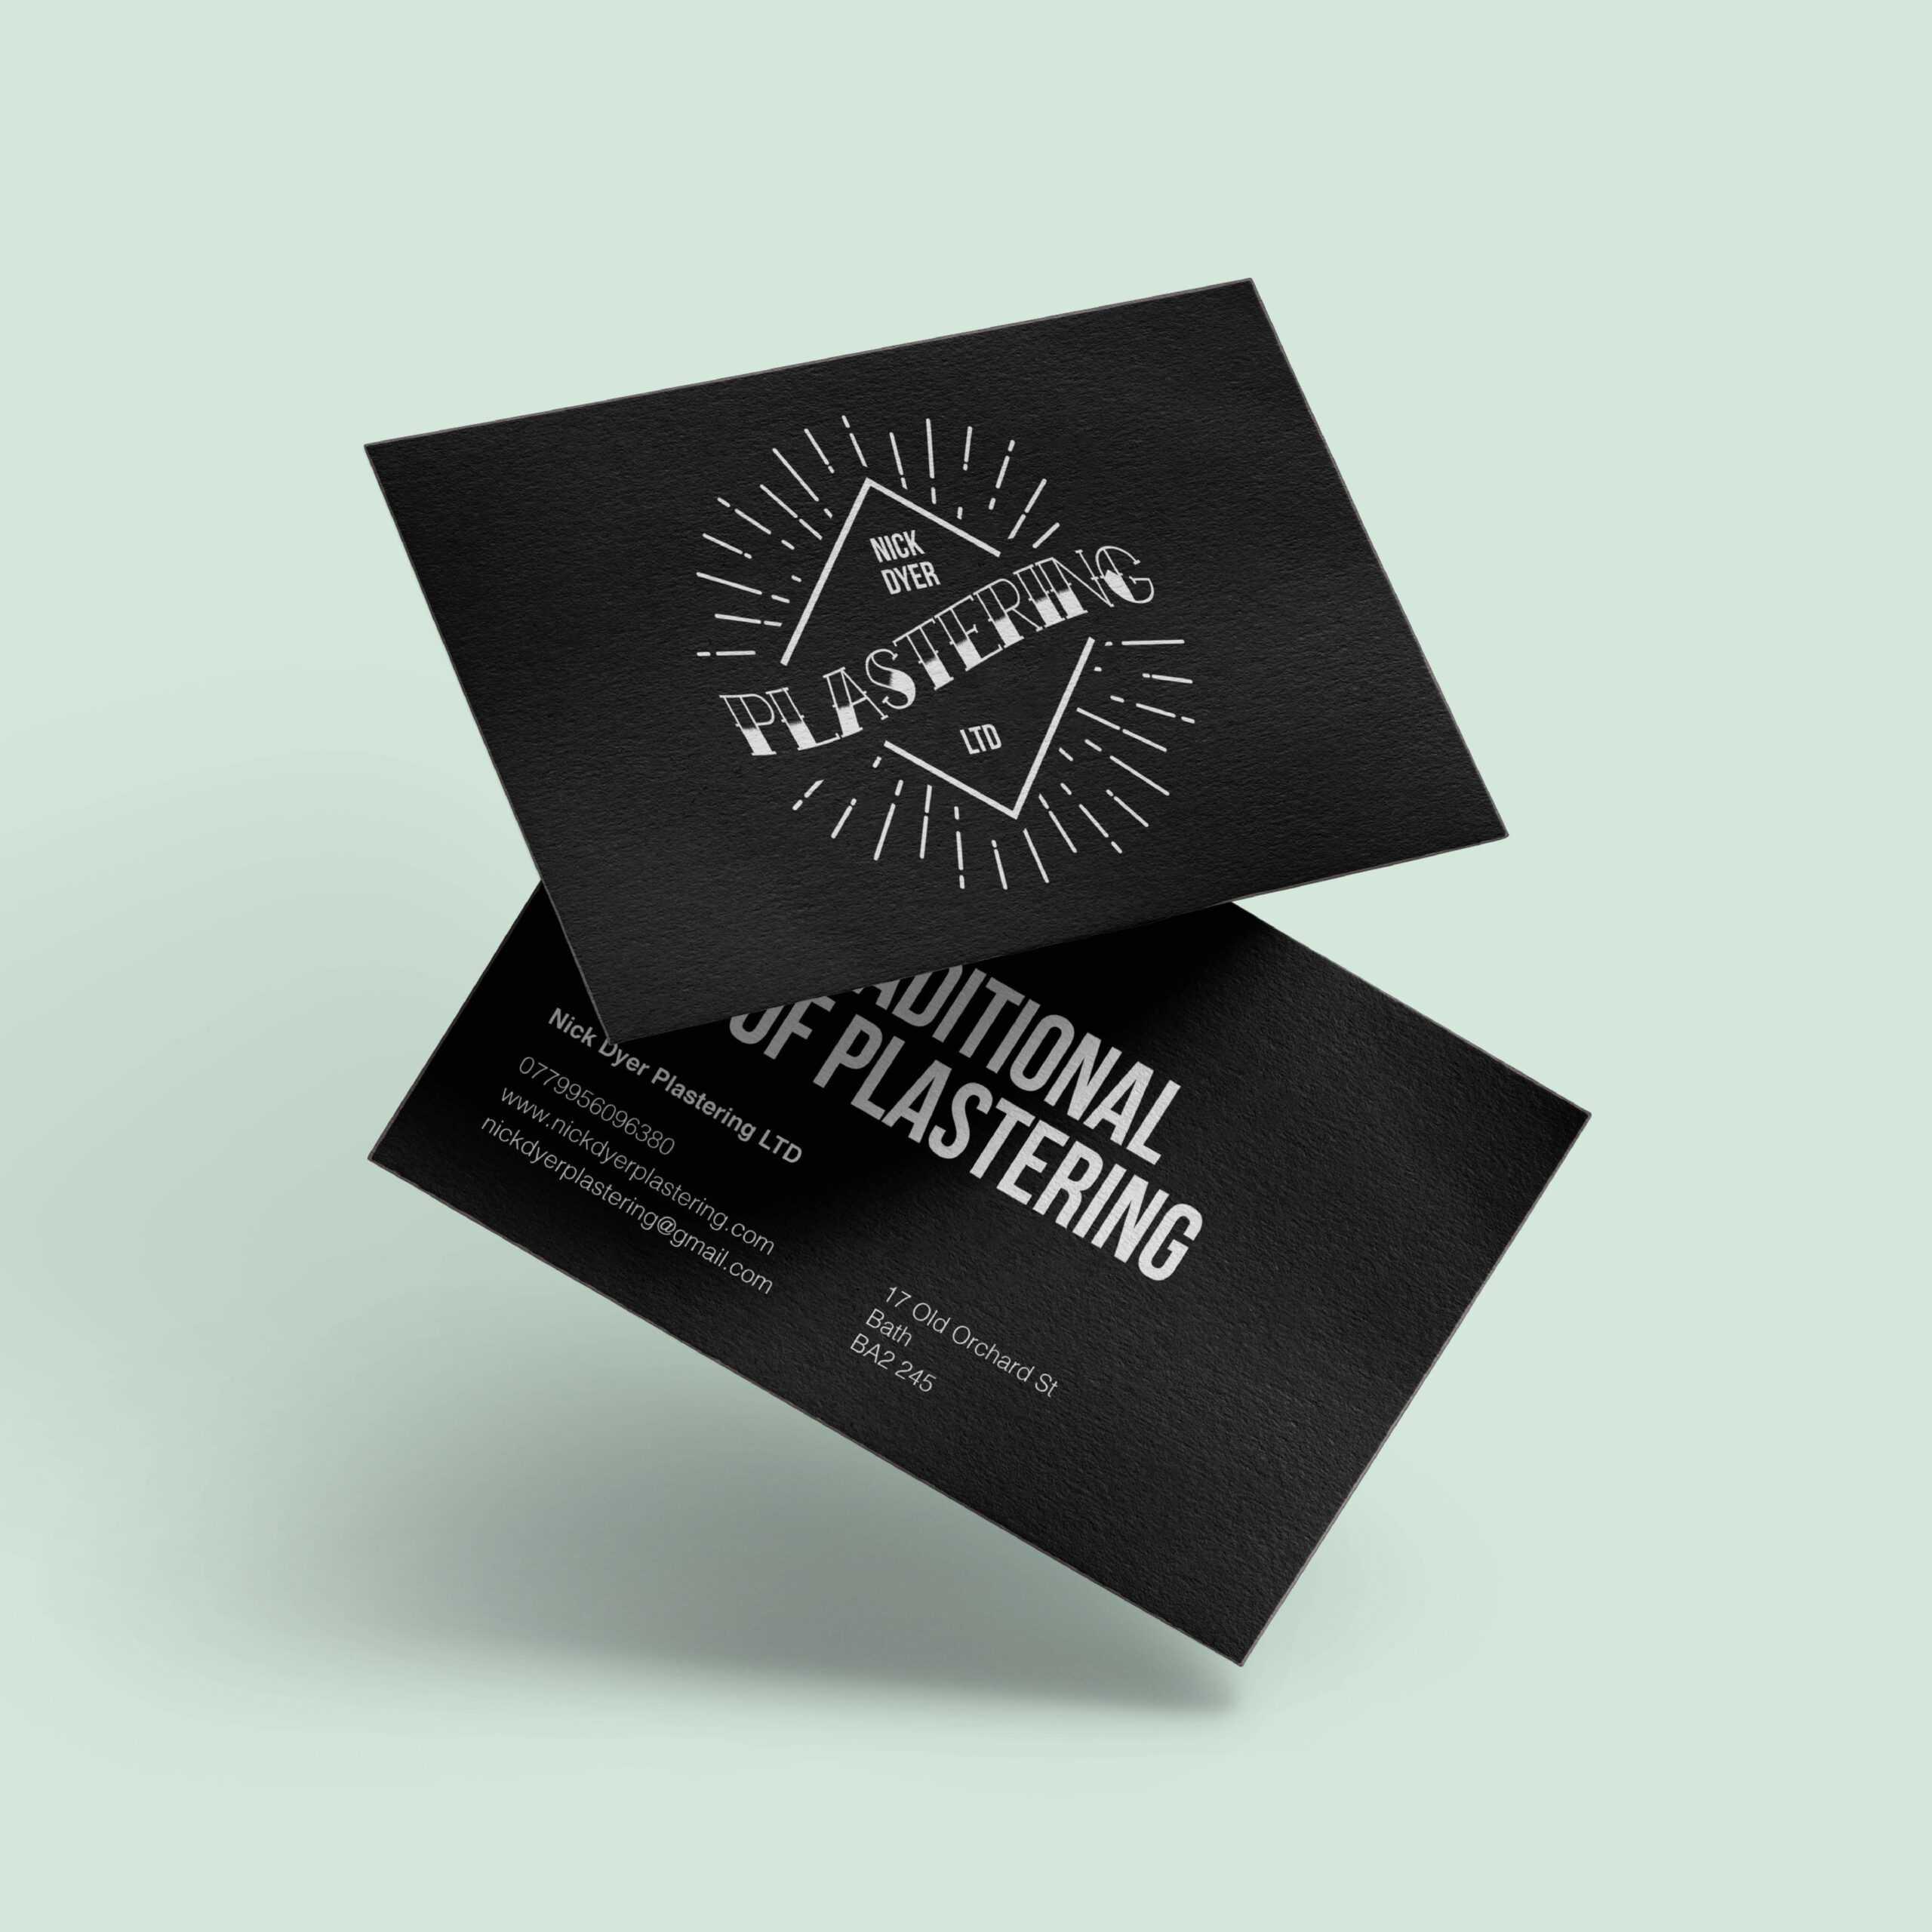 Nick Dyer Plastering   Createdjasmine Throughout Plastering Business Cards Templates